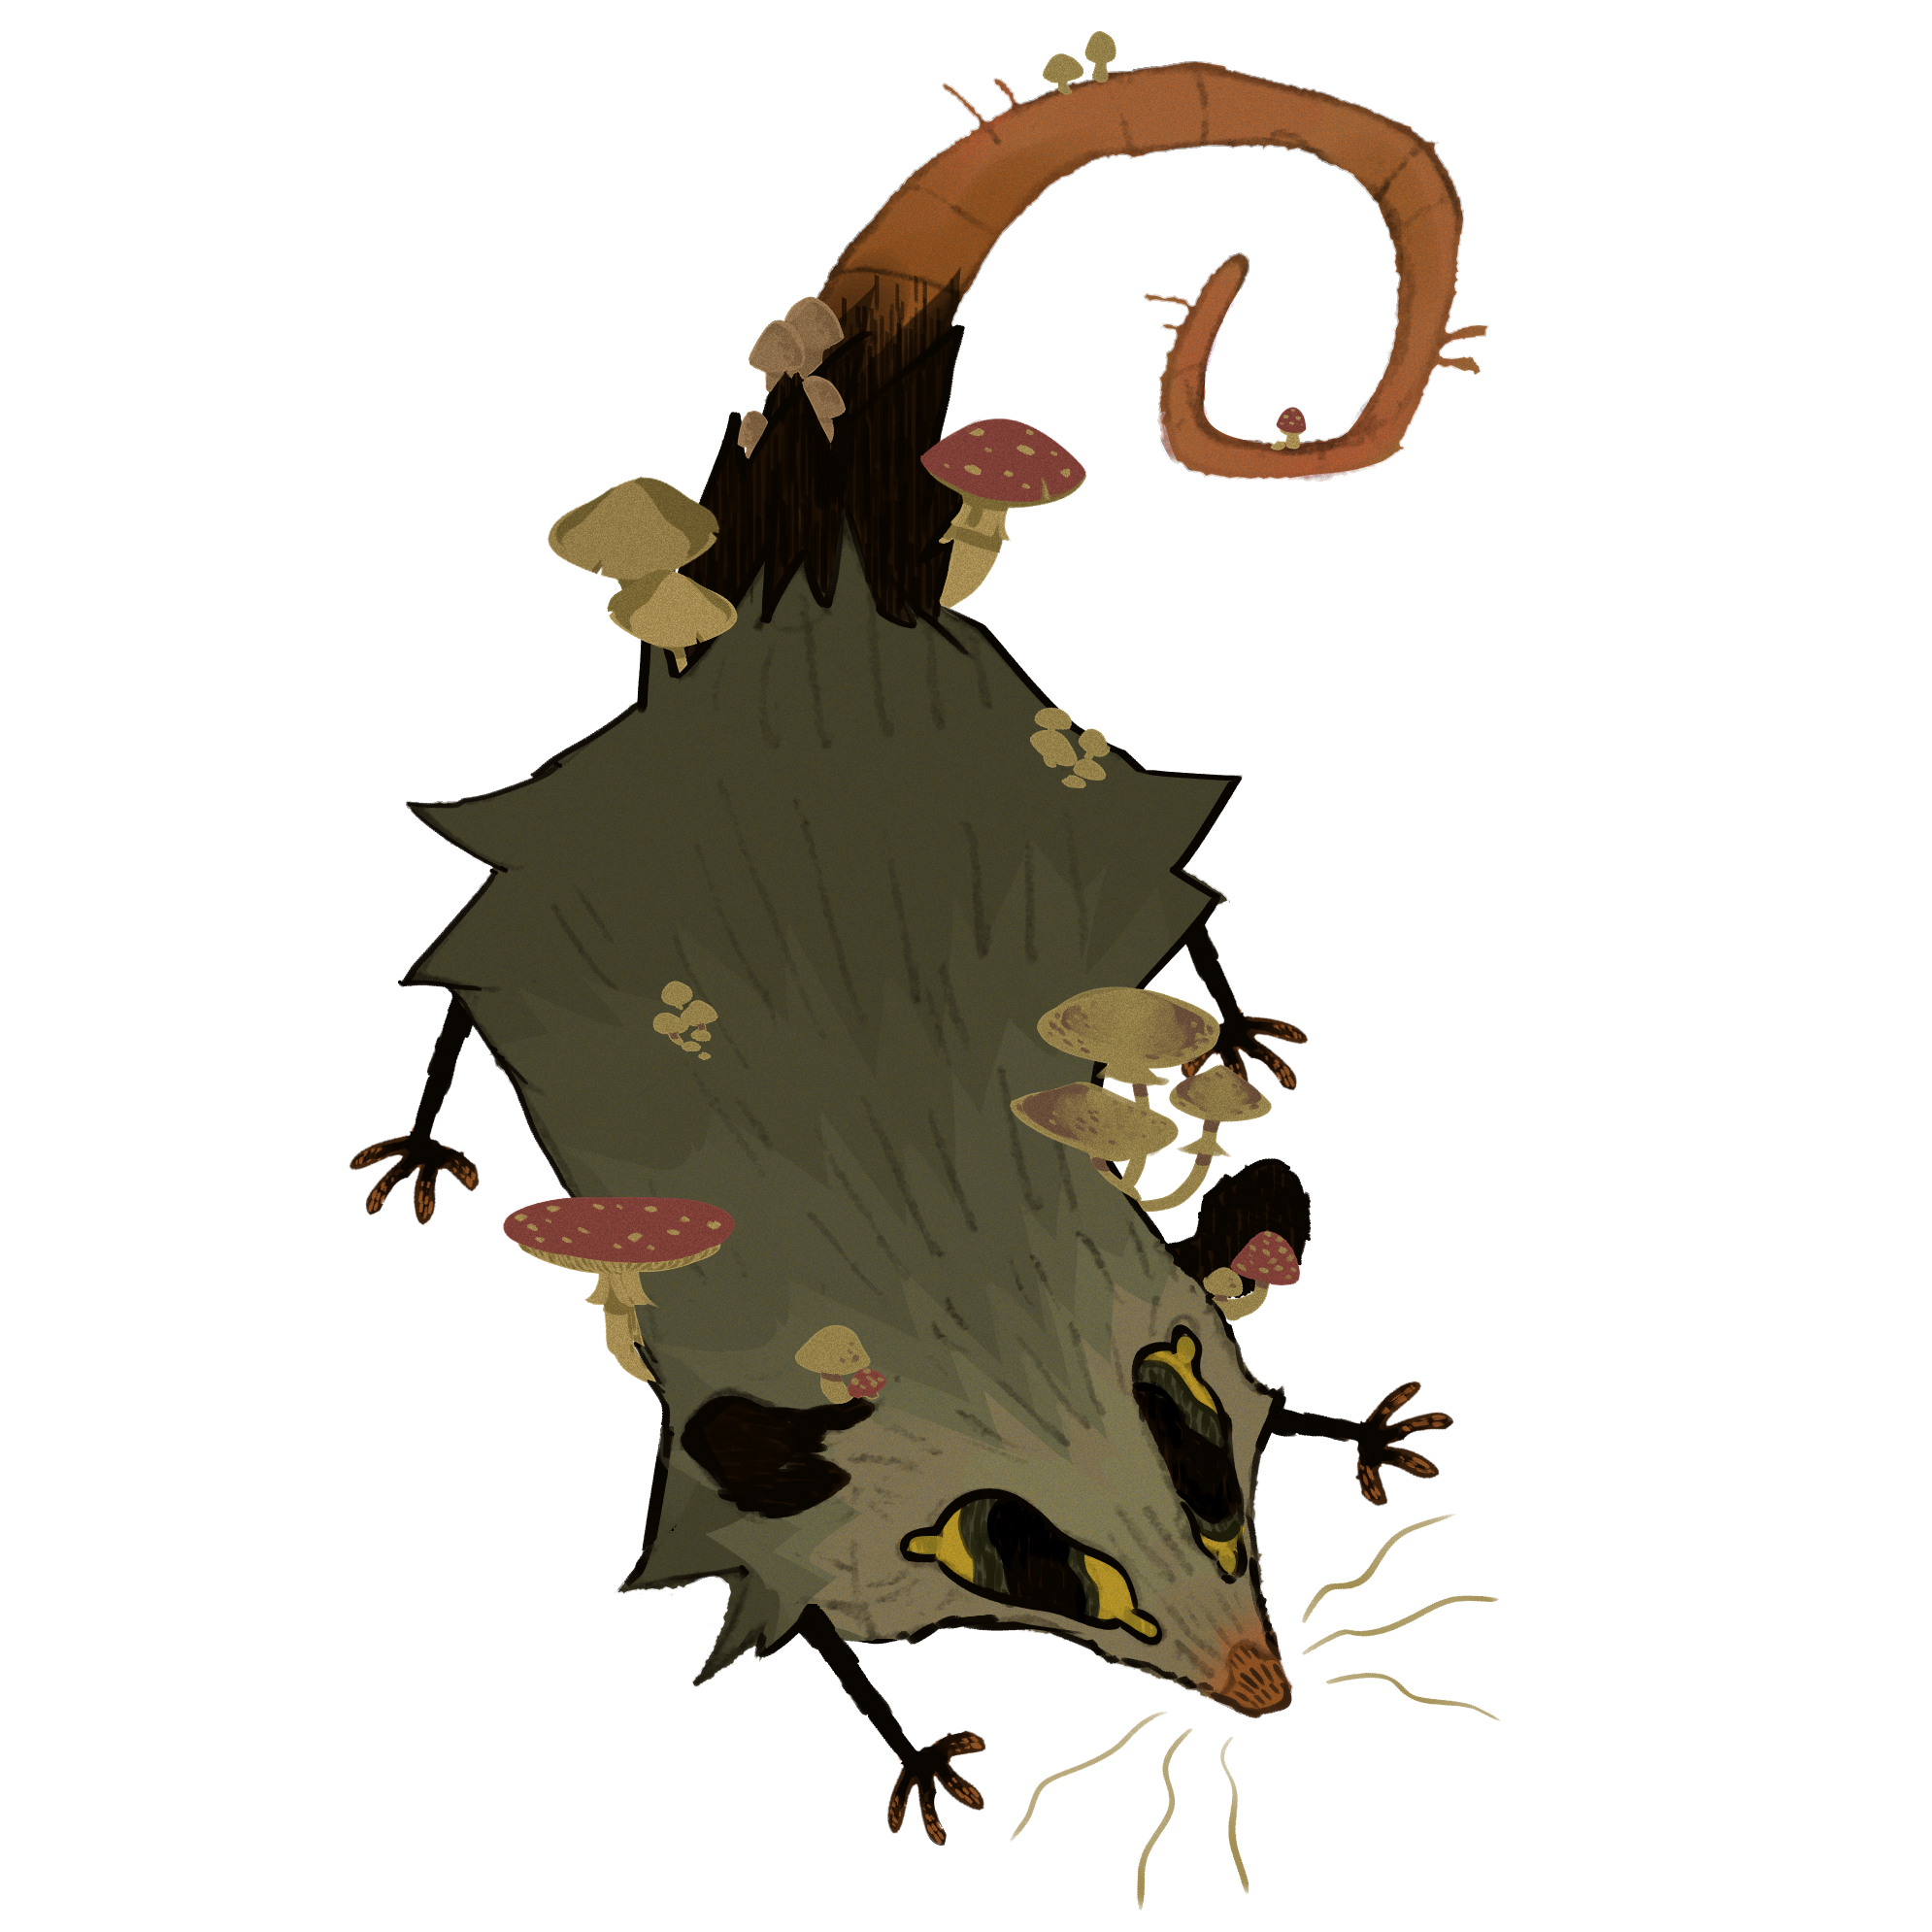 Mushroom opossum 2